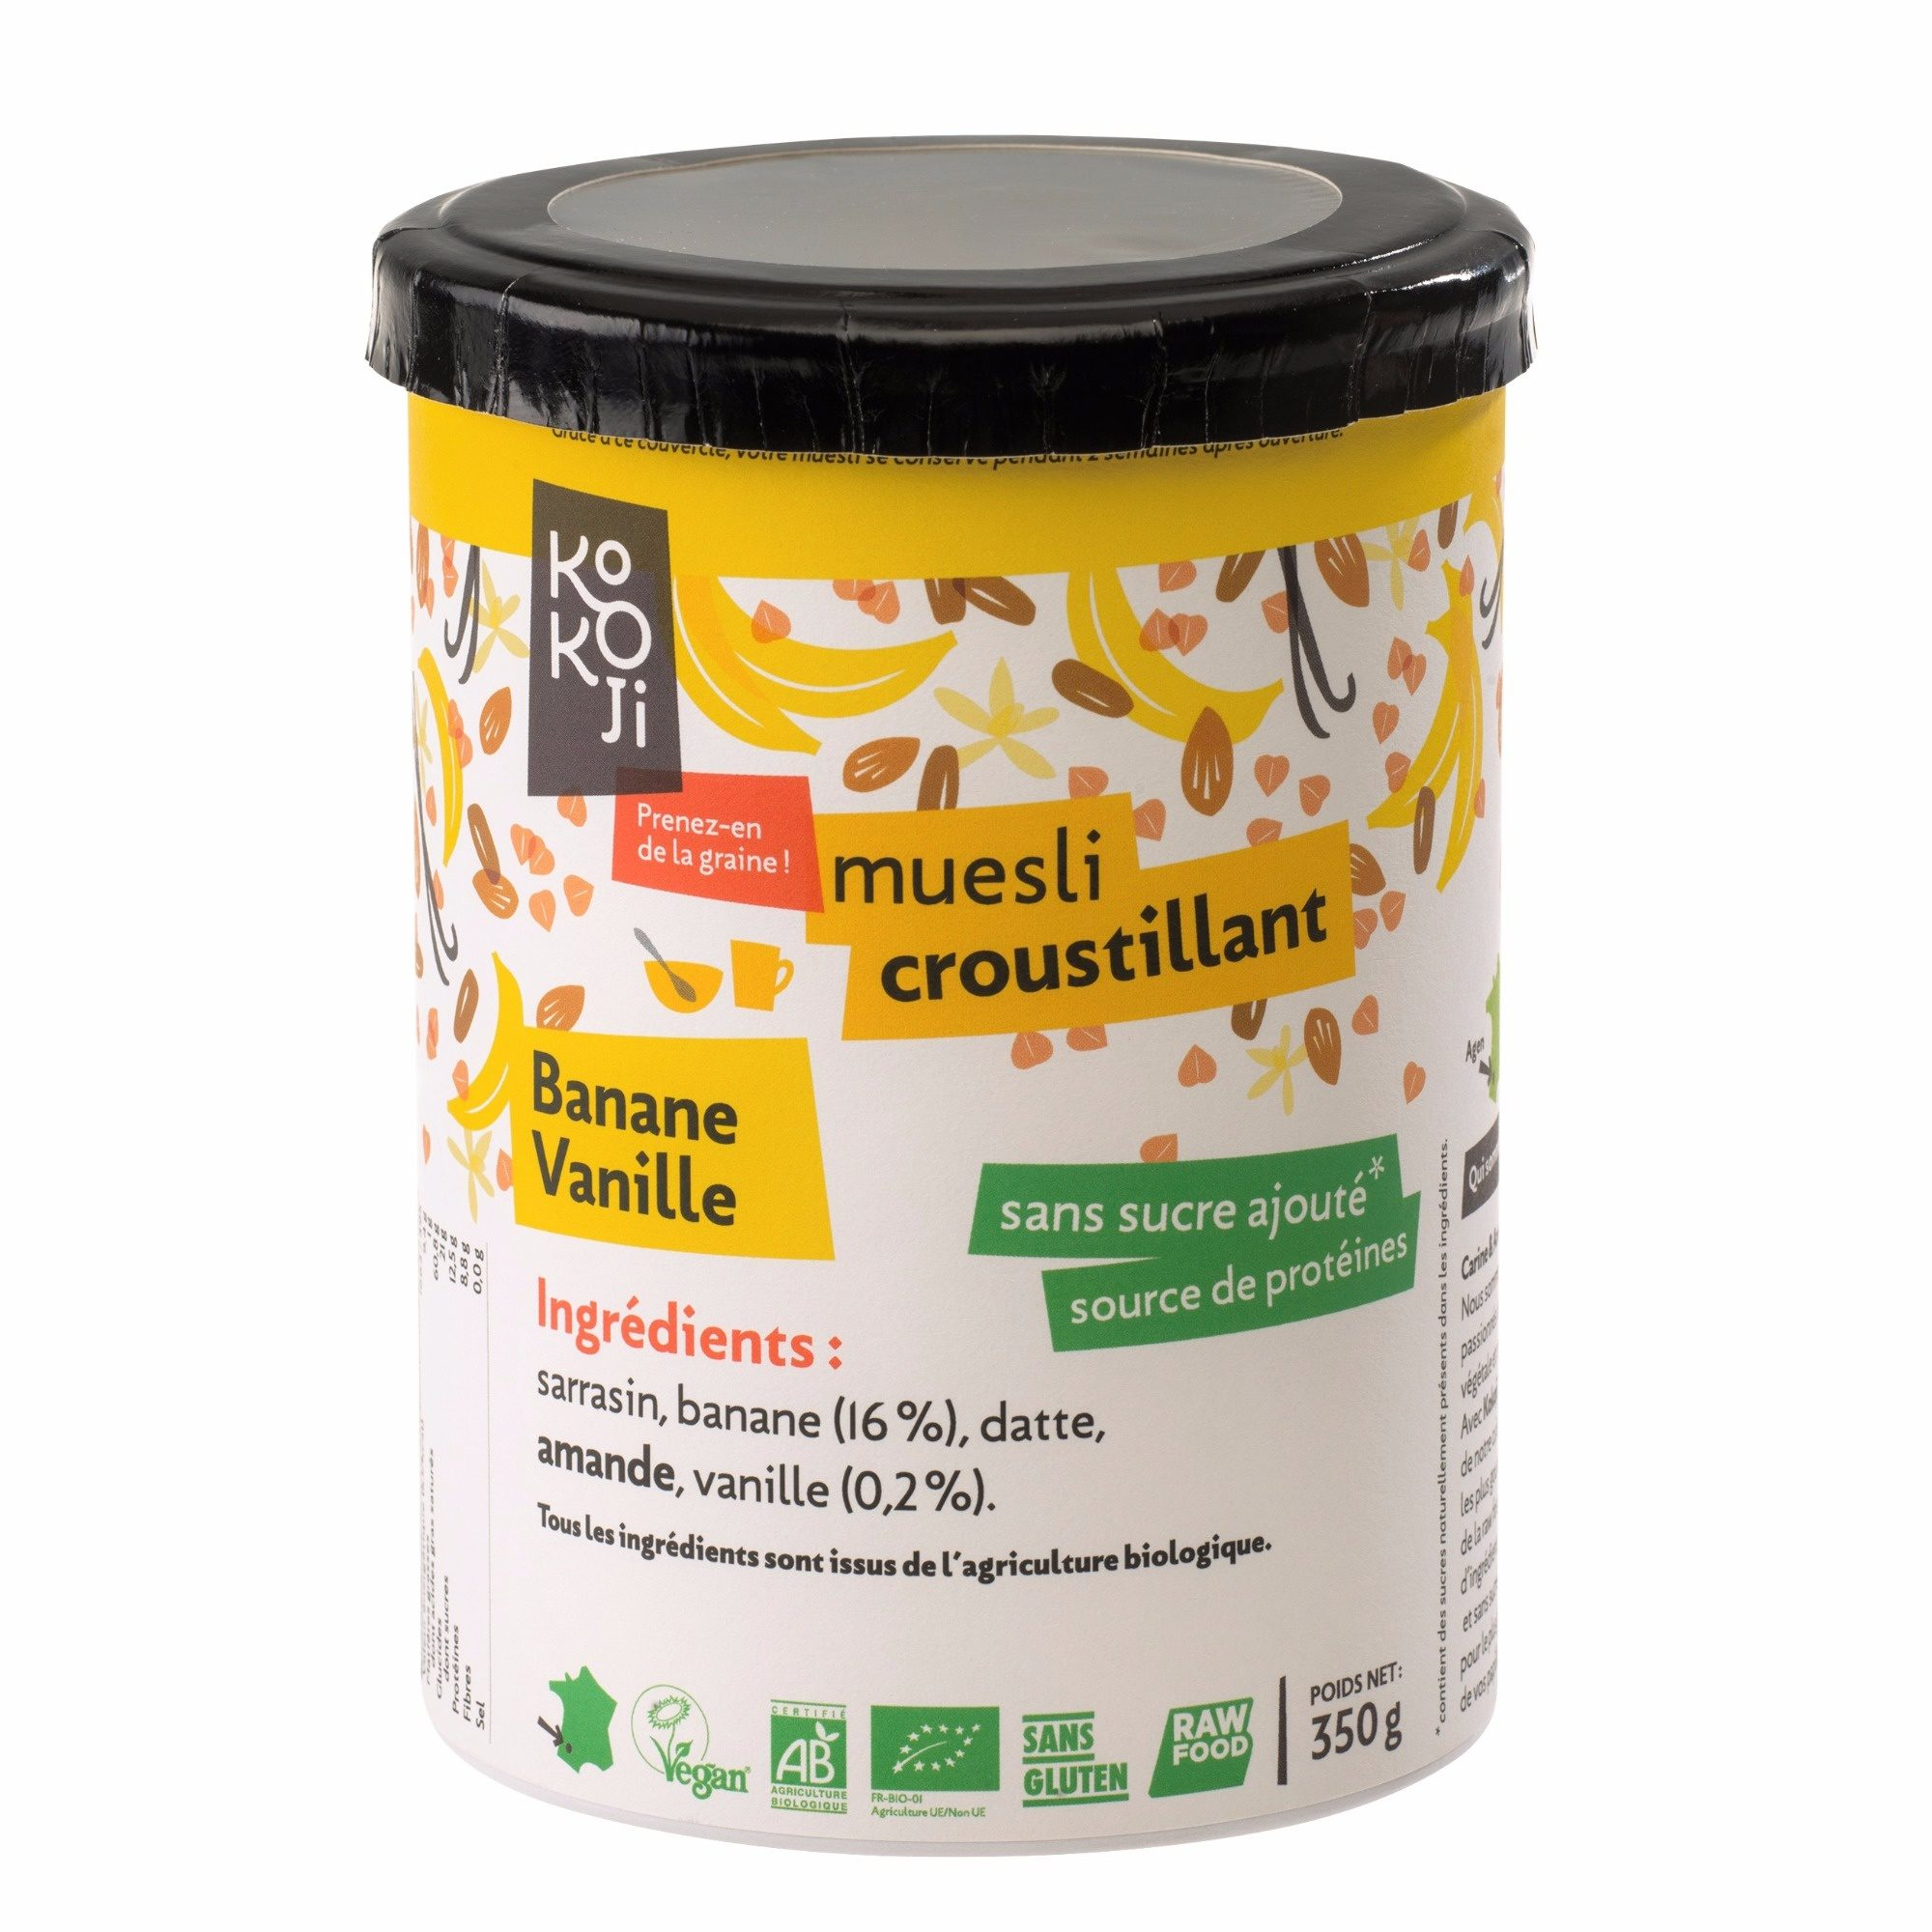 Muesli croustillant banane-vanille Kokoji - Produit - fr